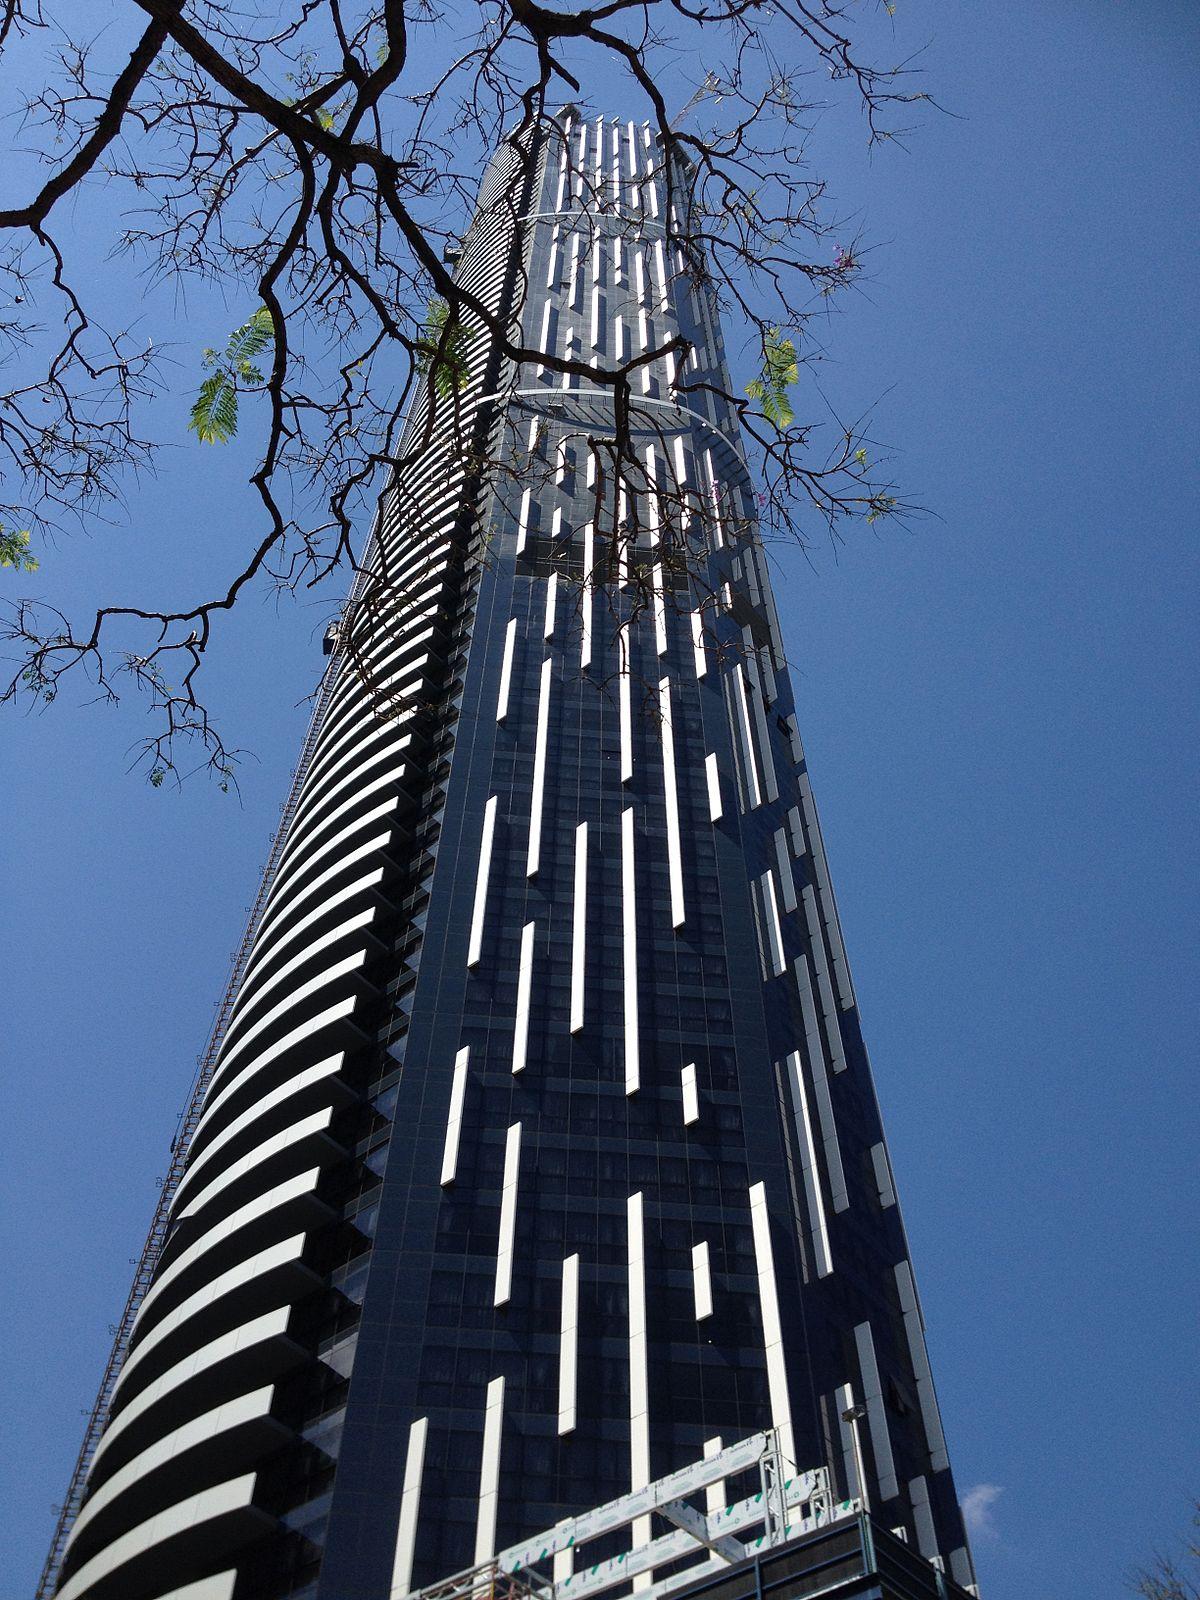 Australian Architecture- 10 Memorable Buildings_8 australian architecture Australian Architecture: 10 Memorable Buildings Australian Architecture 10 Memorable Buildings 8